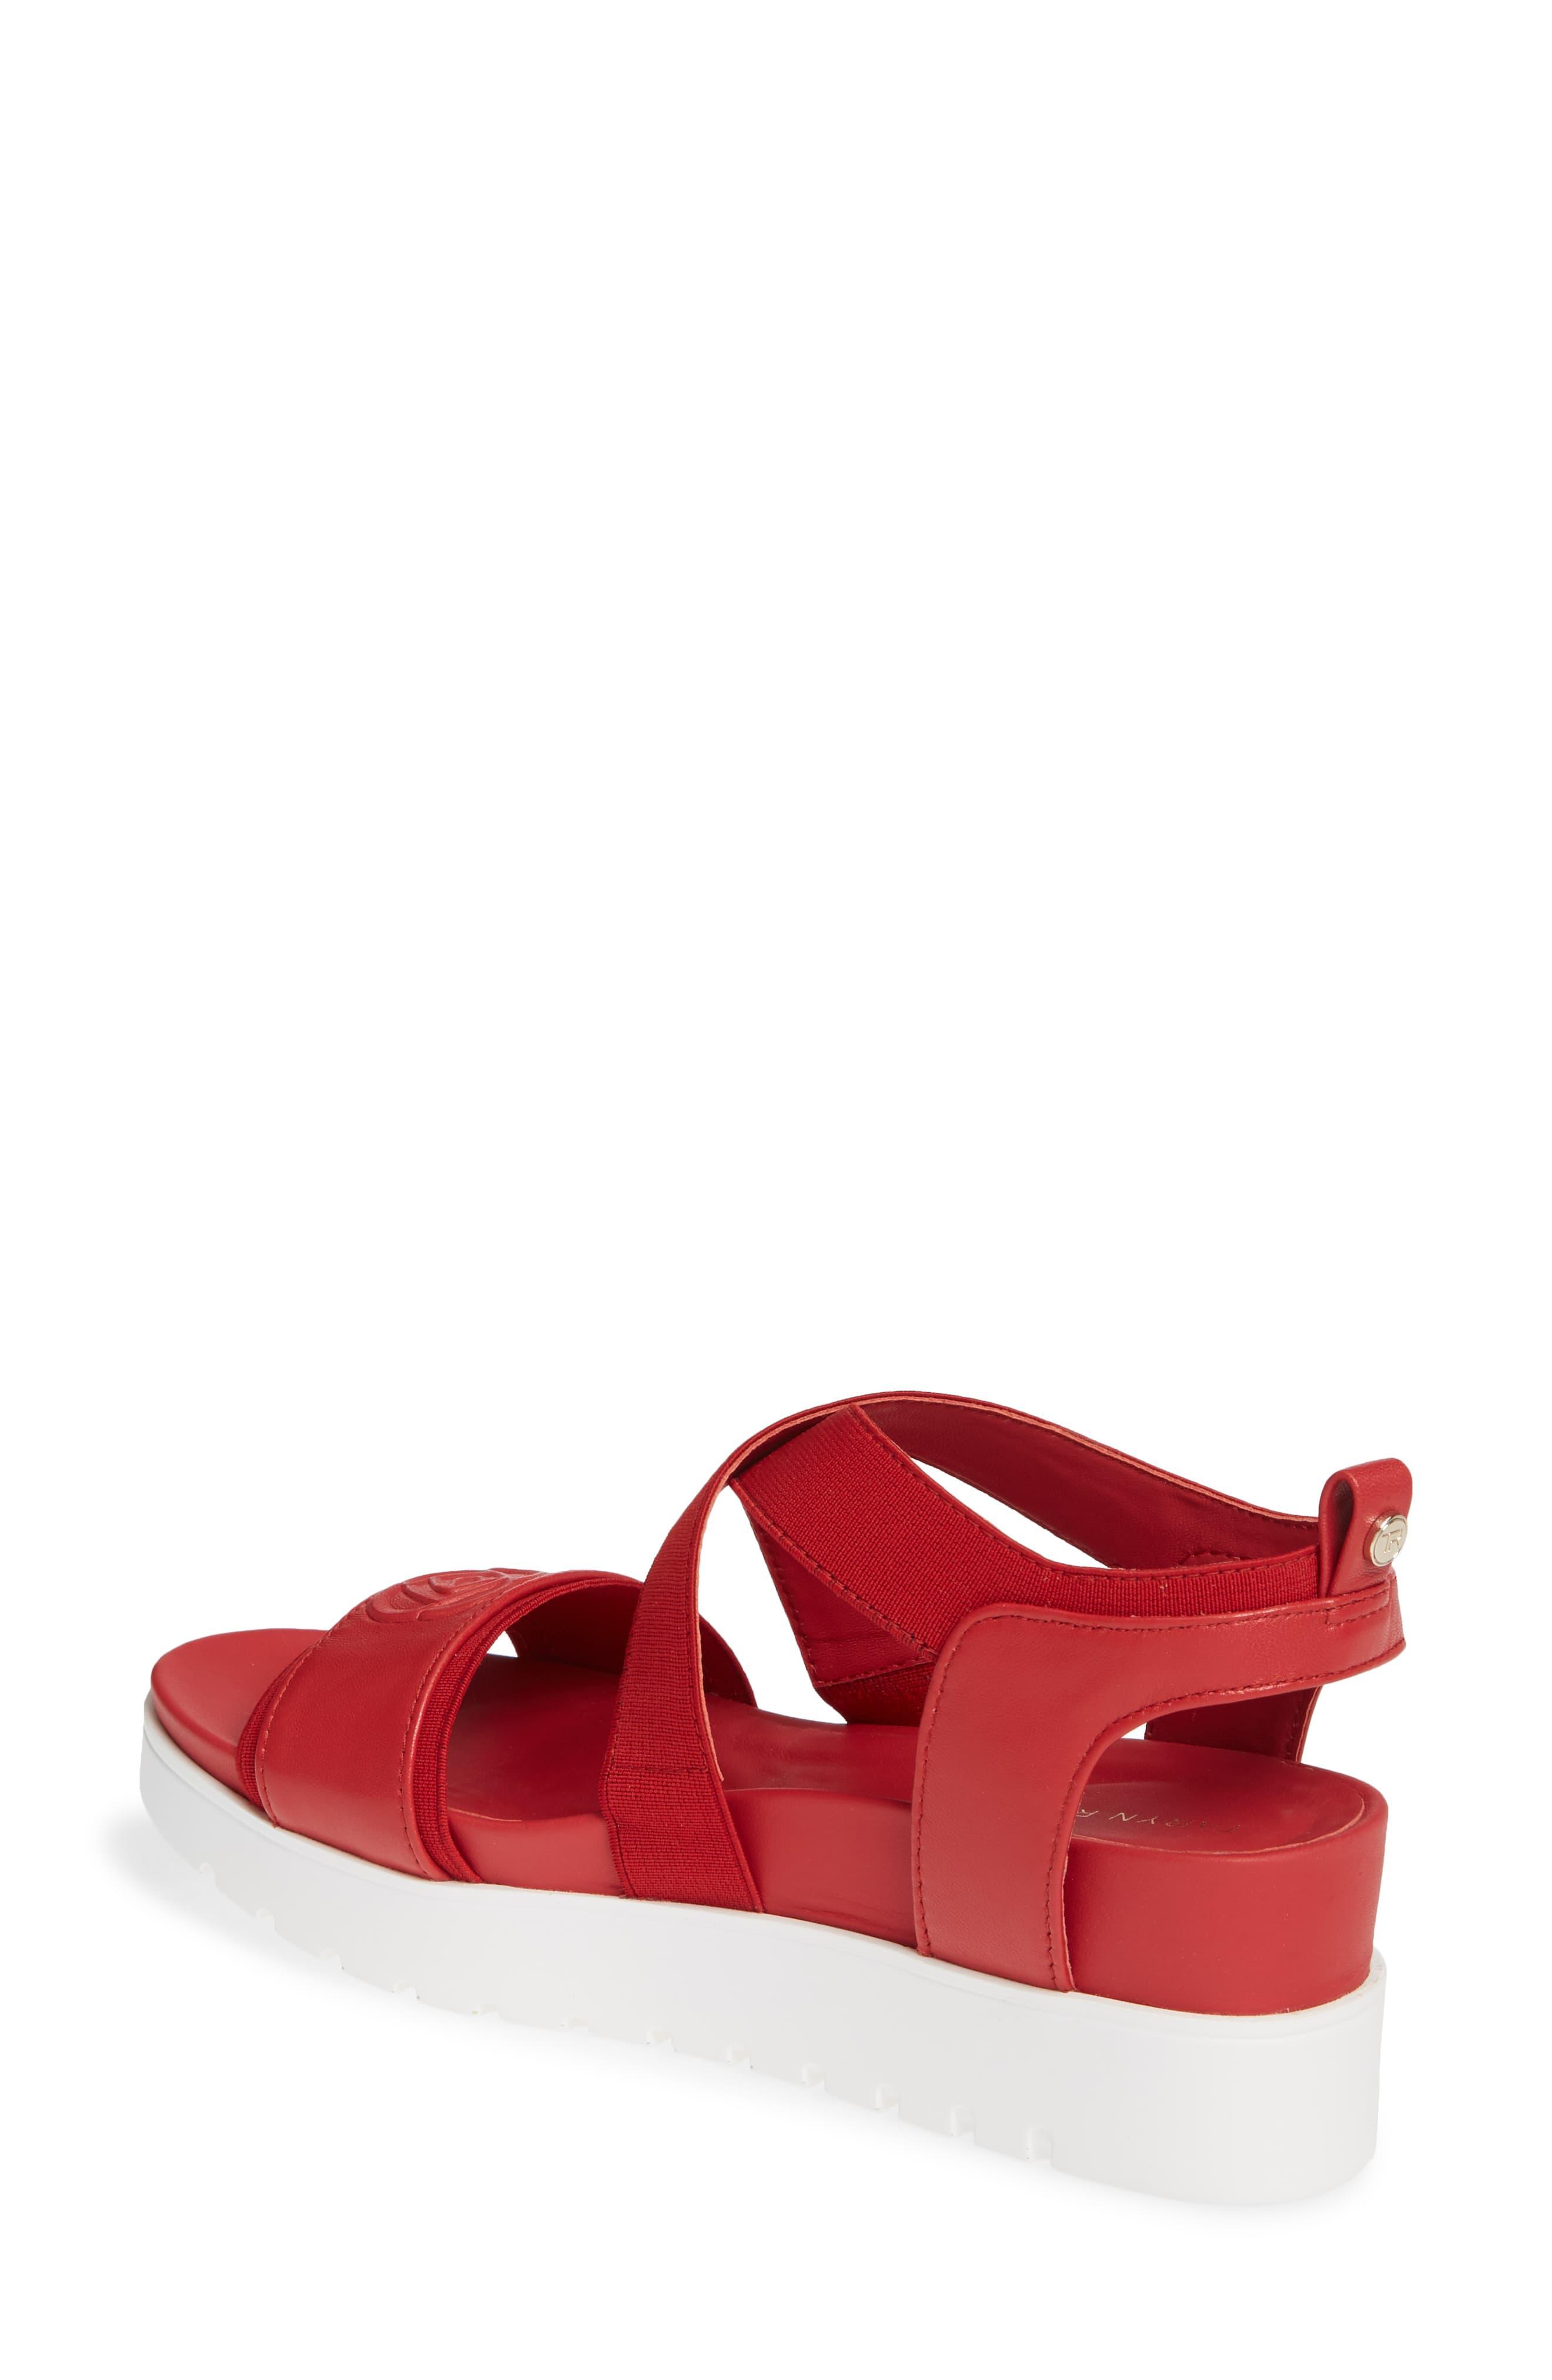 ce1a68f7f29 Lyst - Taryn Rose Stephanie Wedge Sandal in Red - Save 40%